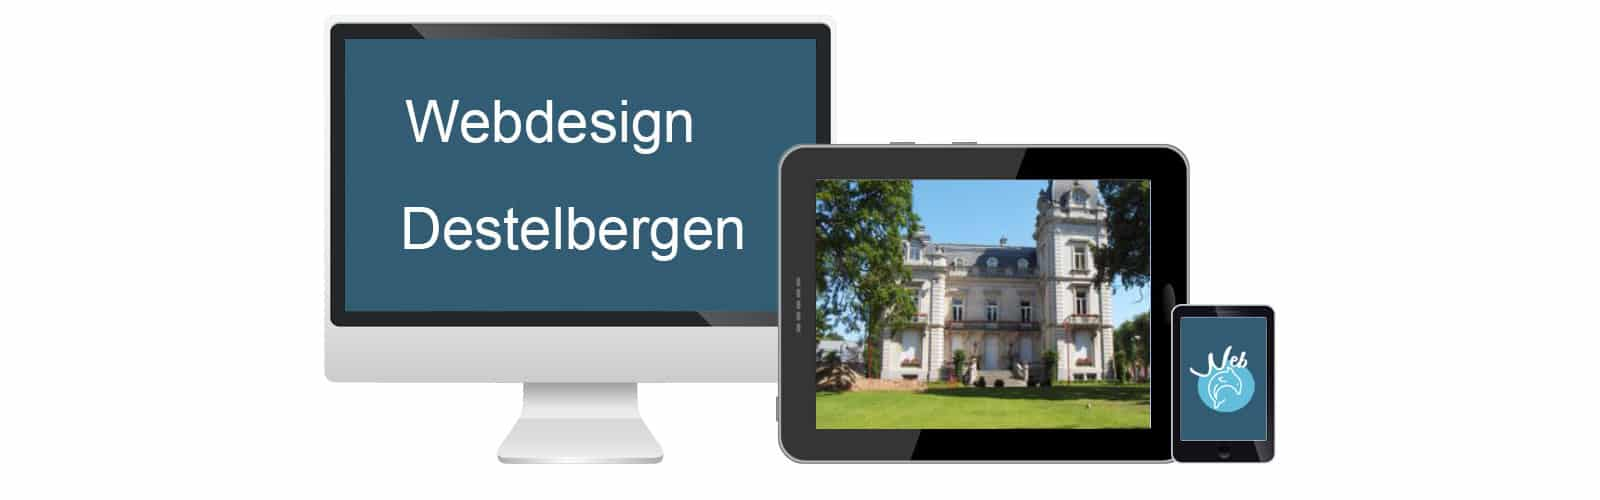 Webdesign Destelbergen - webdolfijn